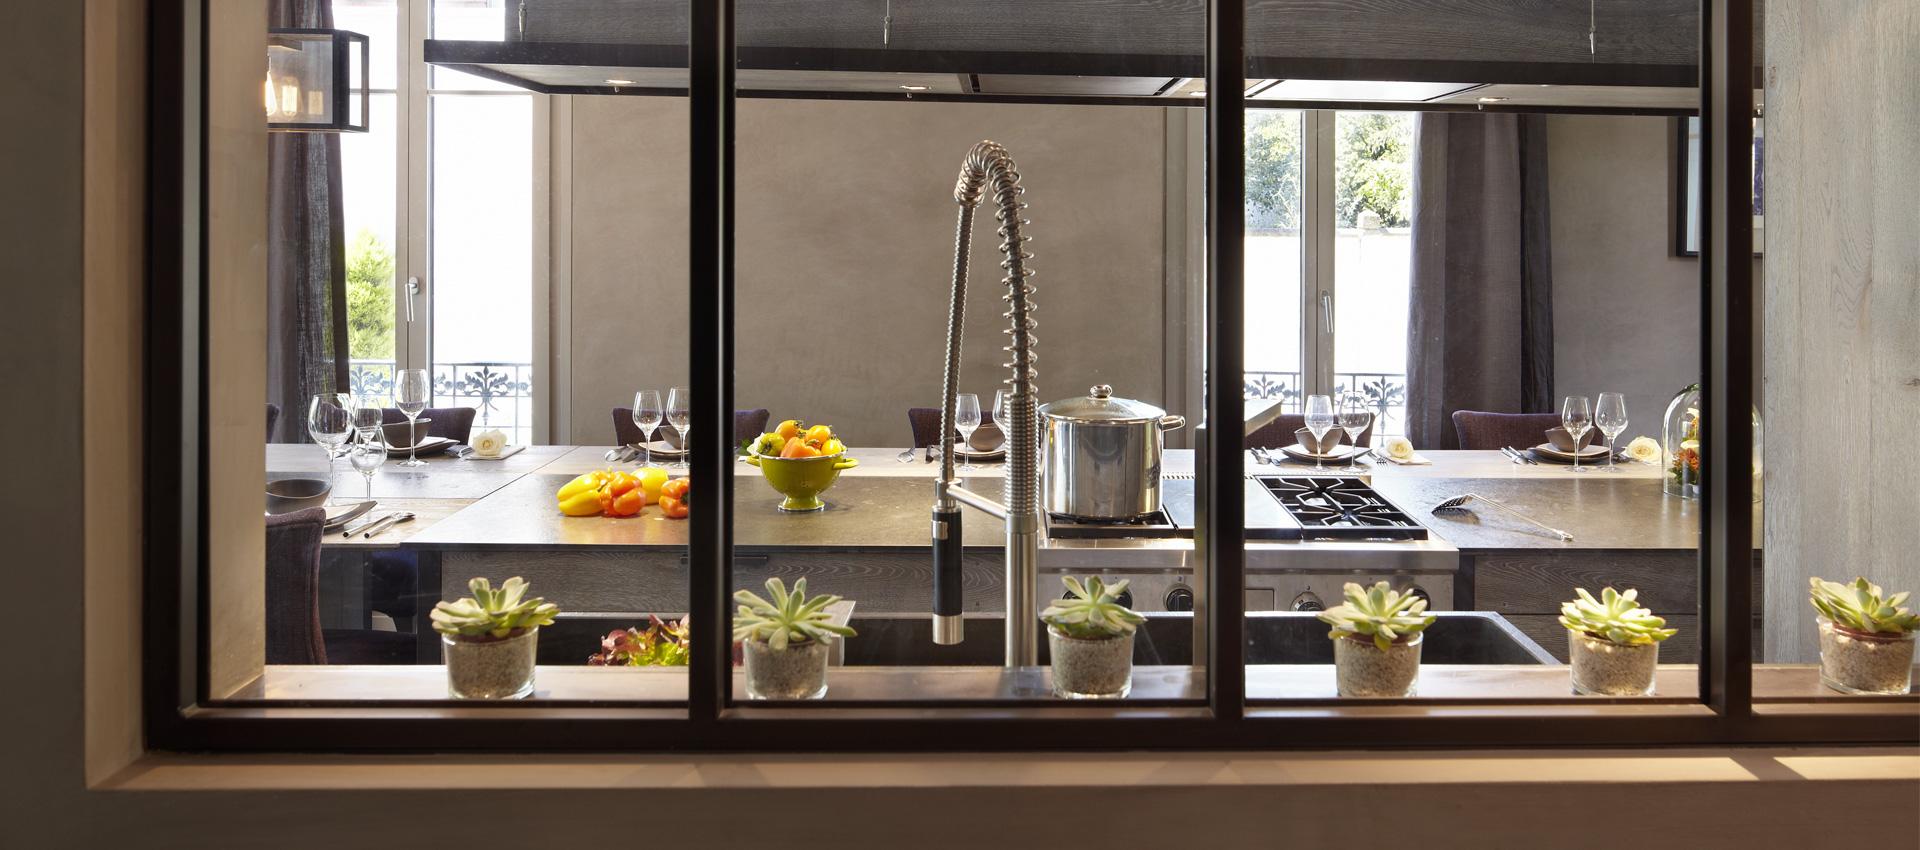 Xavie 39 z cuisines contemporaines salons manger for Cuisine xaviez